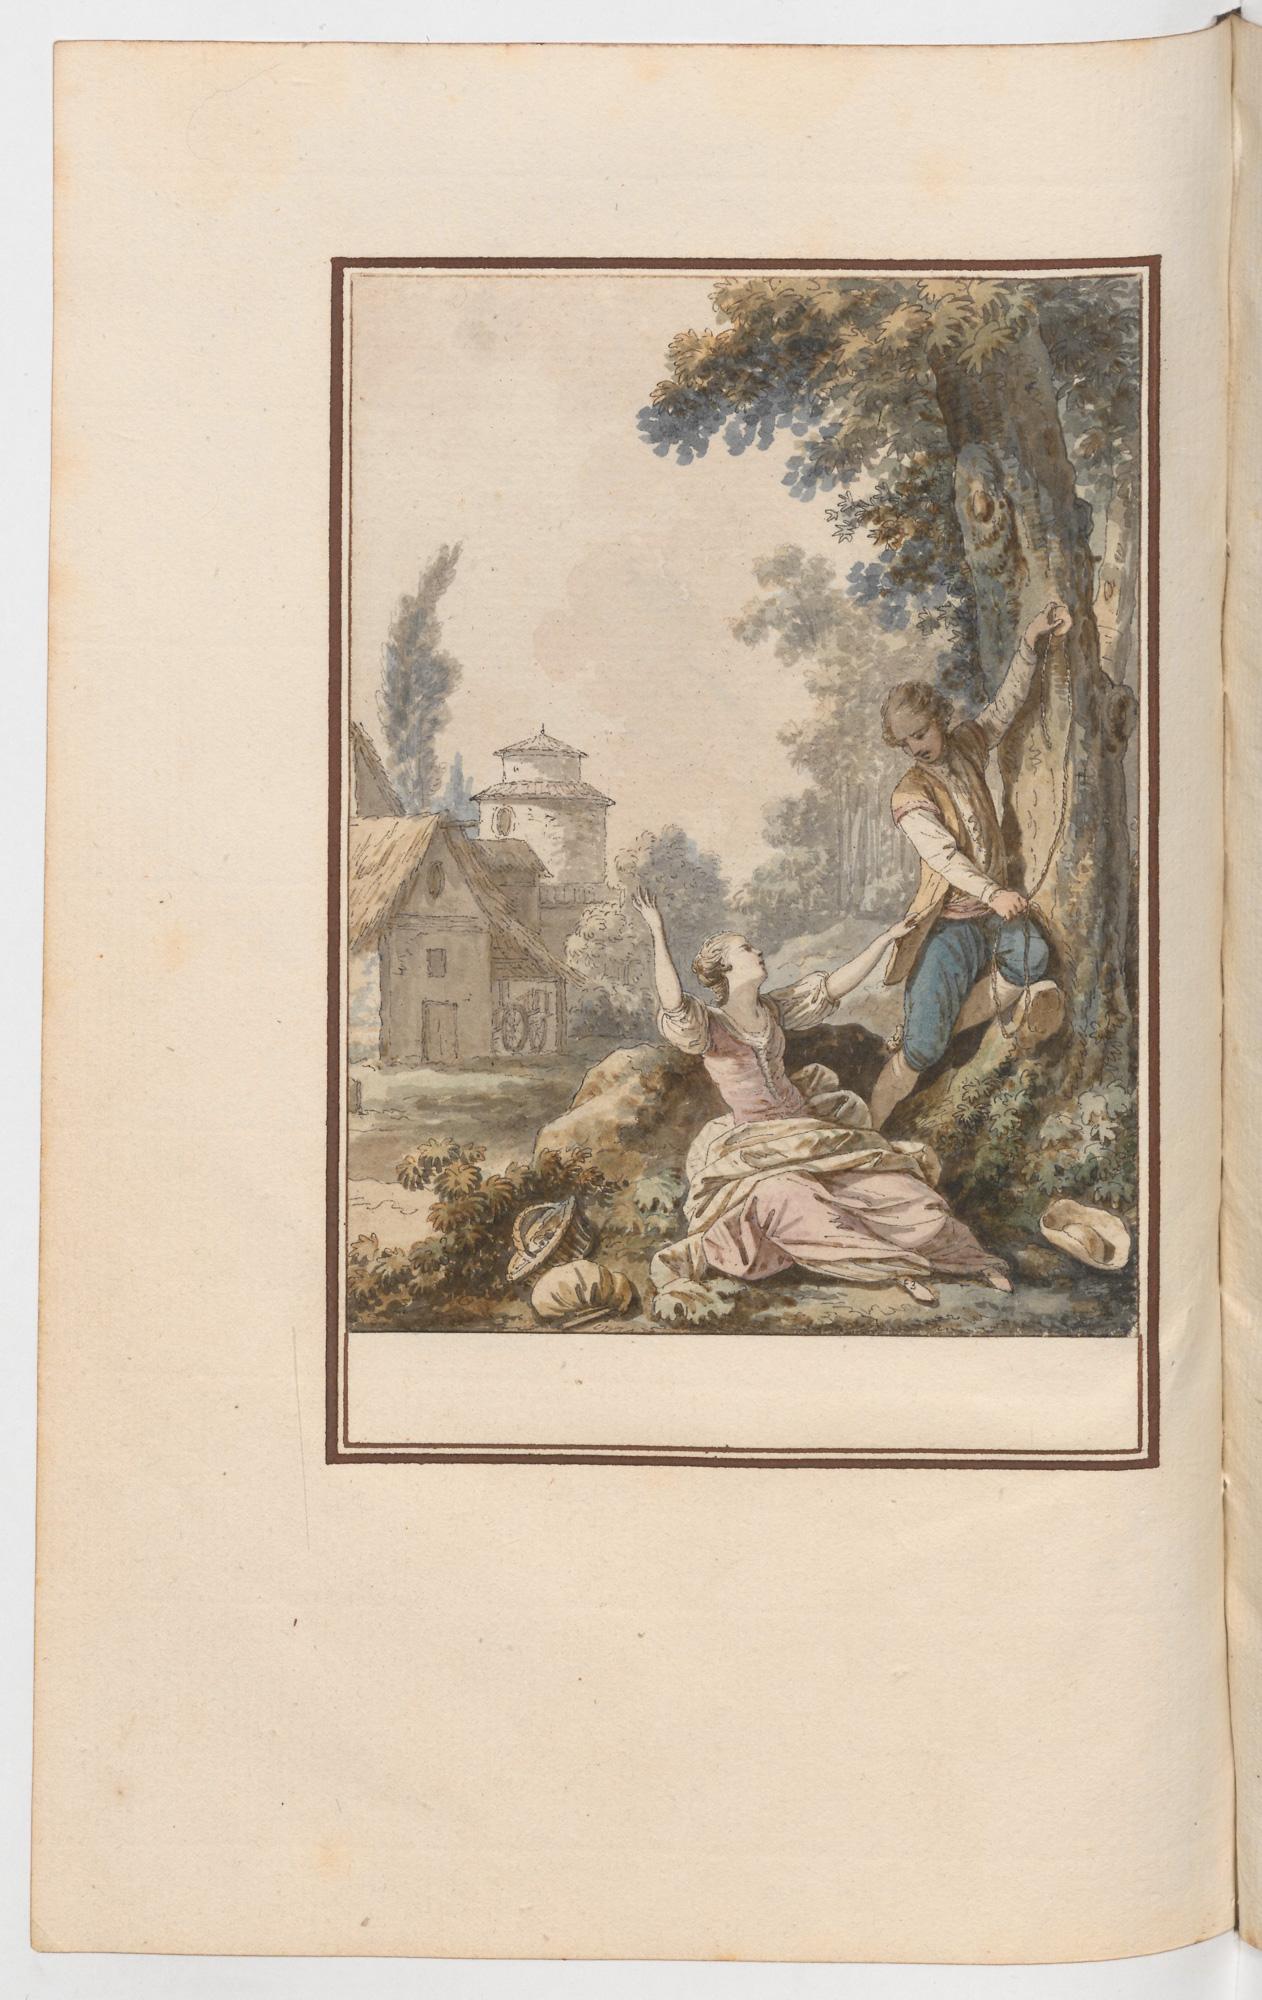 S.3.10 L'heureuse menace, Chantilly, Image